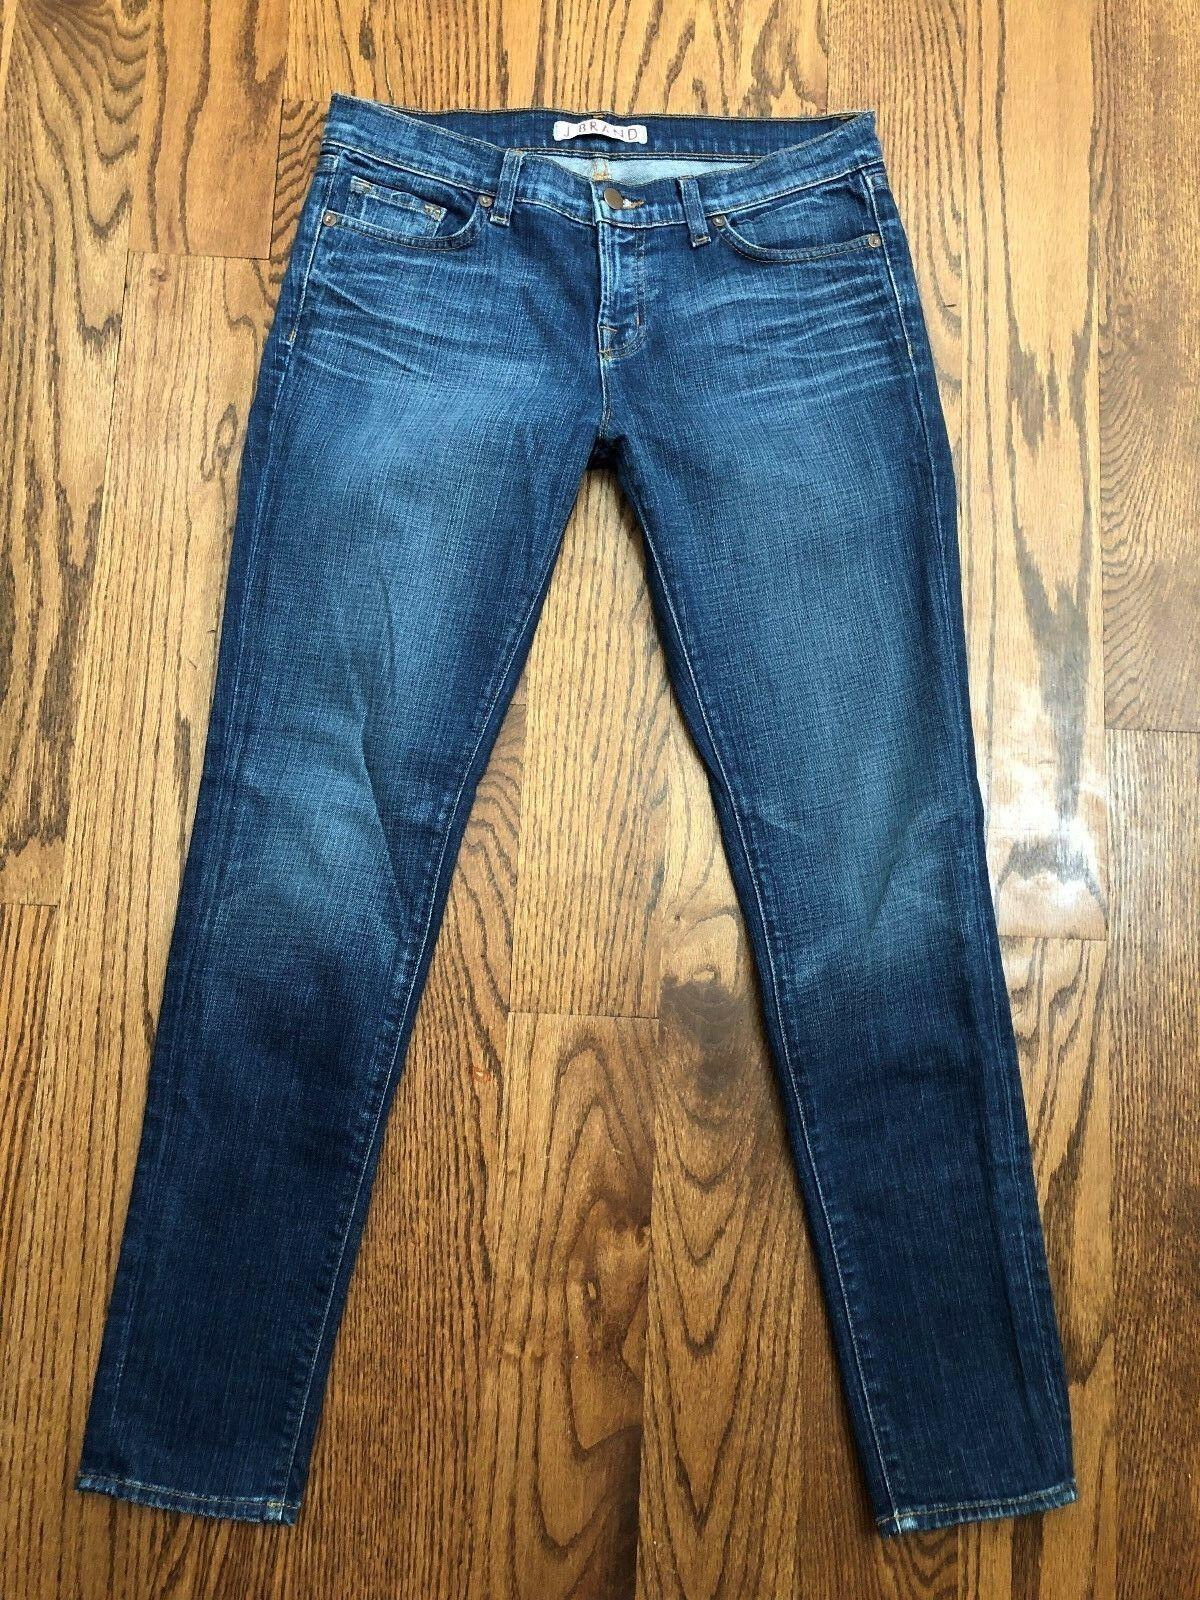 30 x 29.5 Women's J Brand 910 Bayou Skinny Leg Medium Wash Jeans